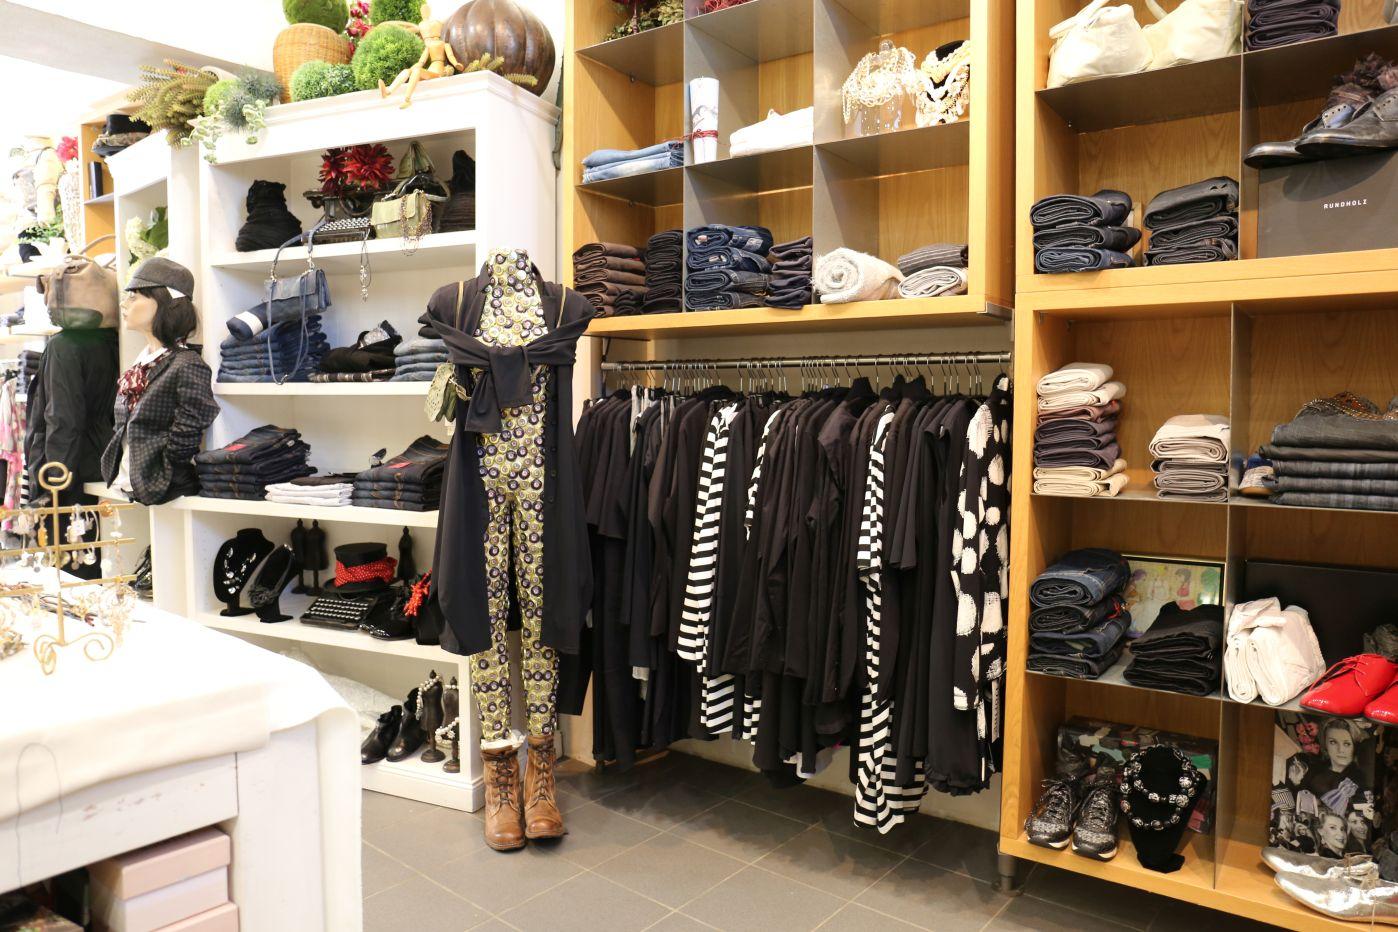 Doering boutique(3)